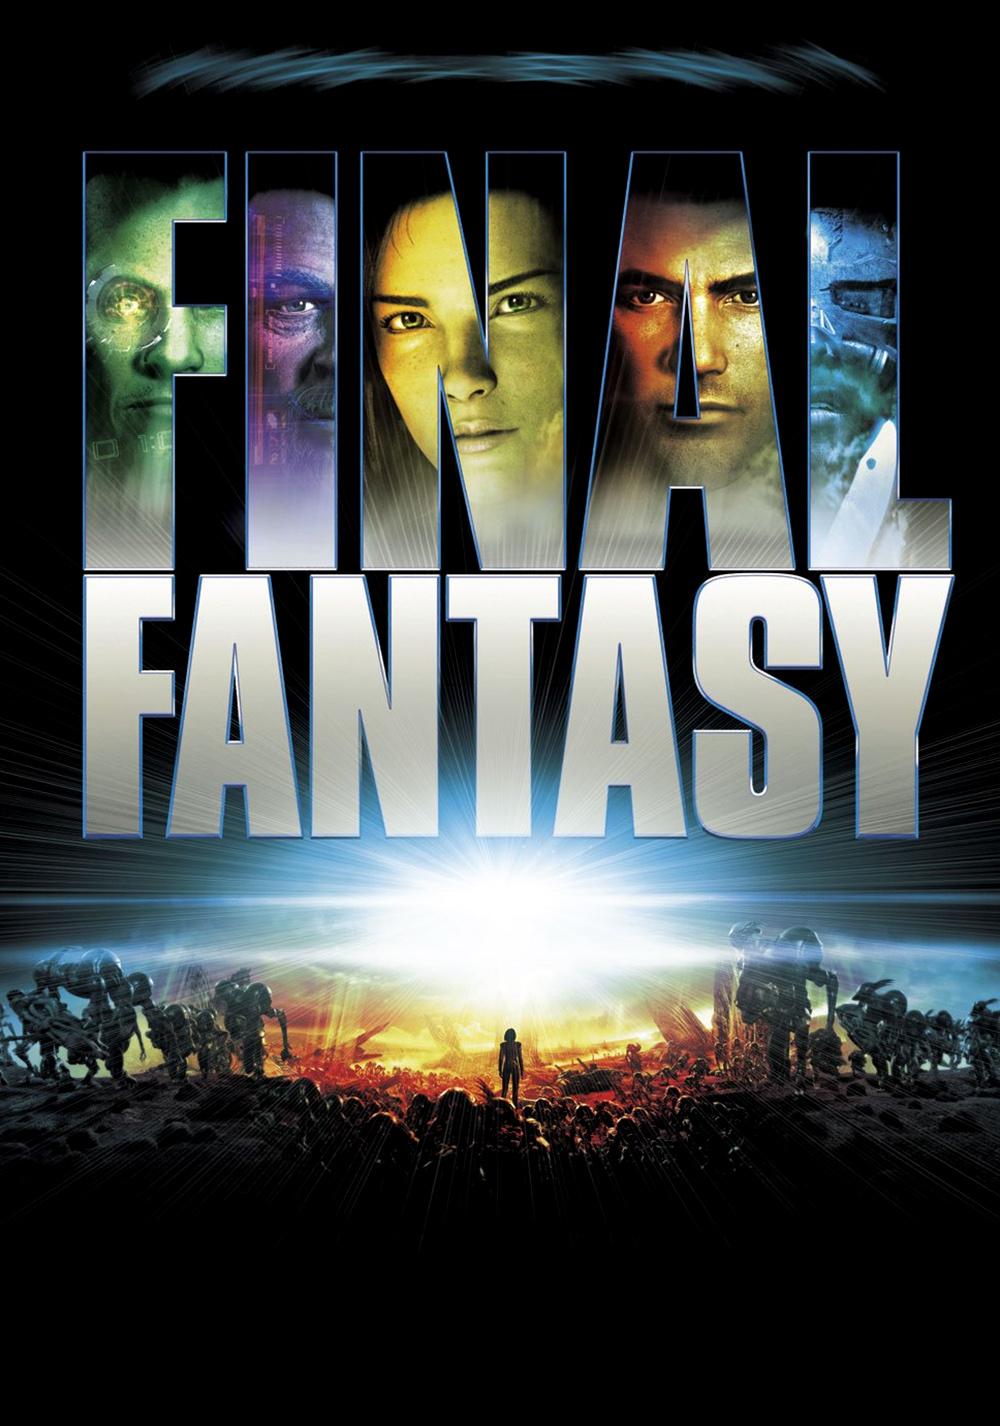 Final Fantasy Movies